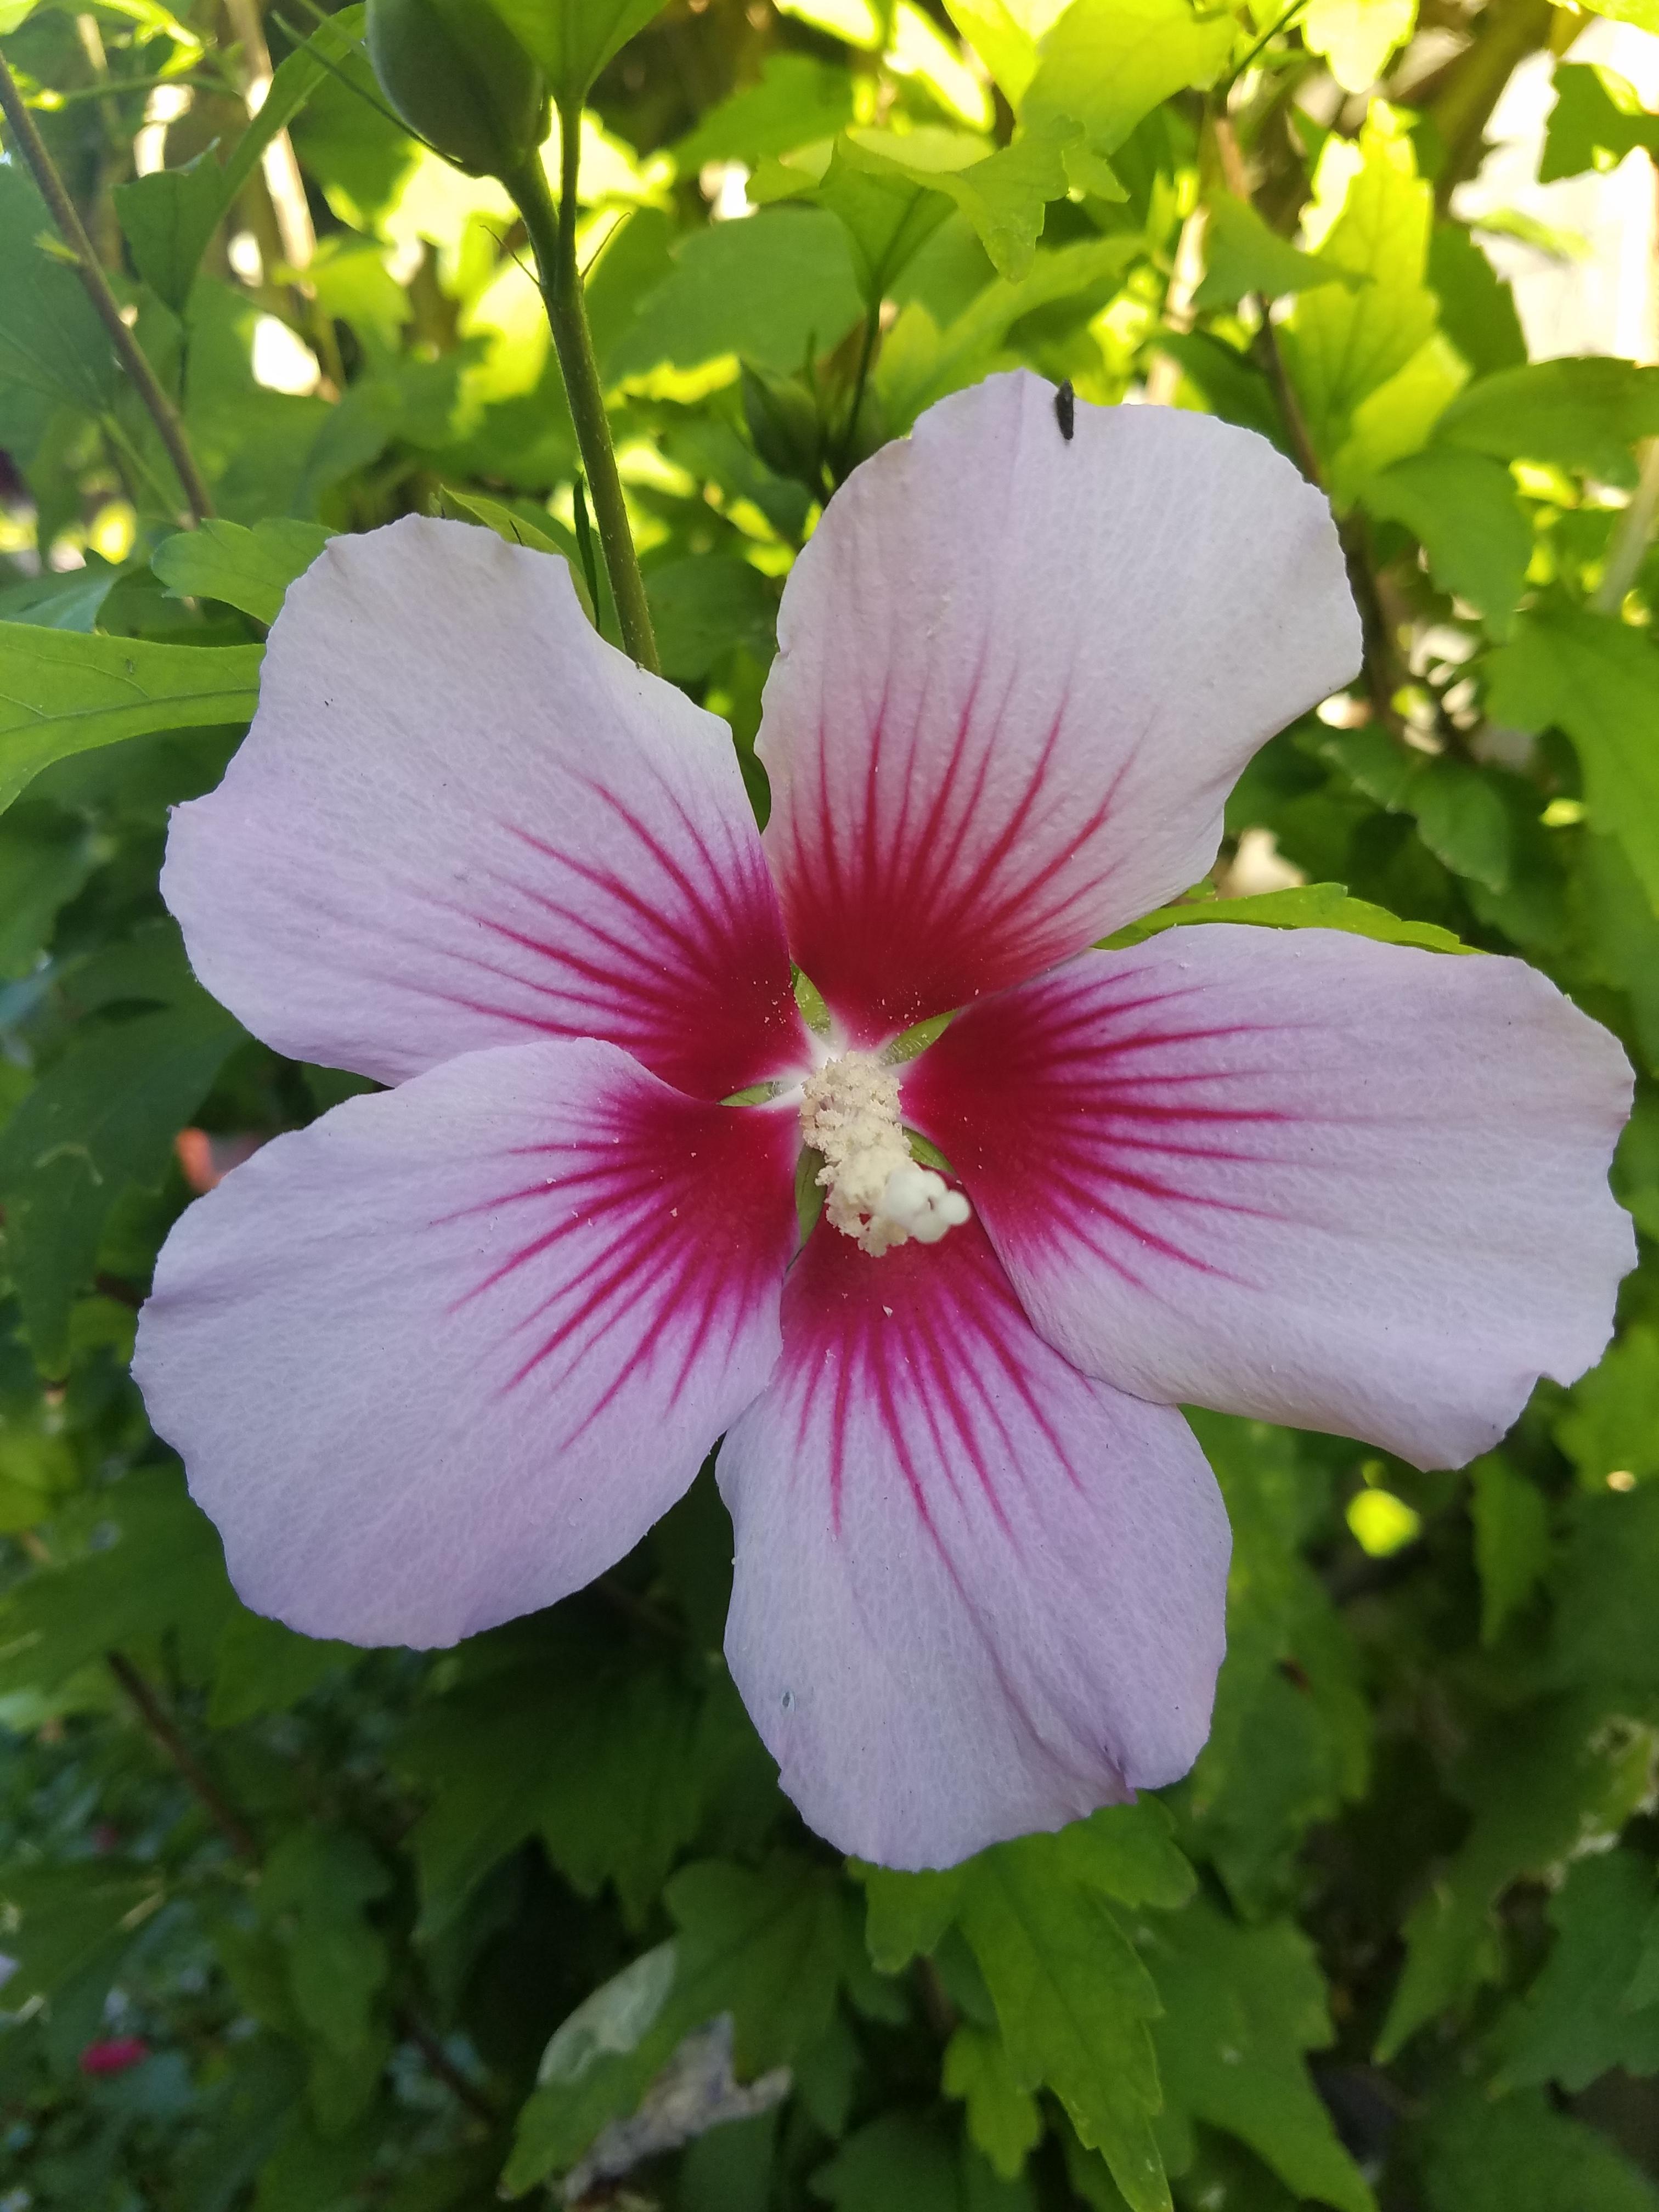 Hibiscus, EndoRealEstateGroup.com, 408.560.9021